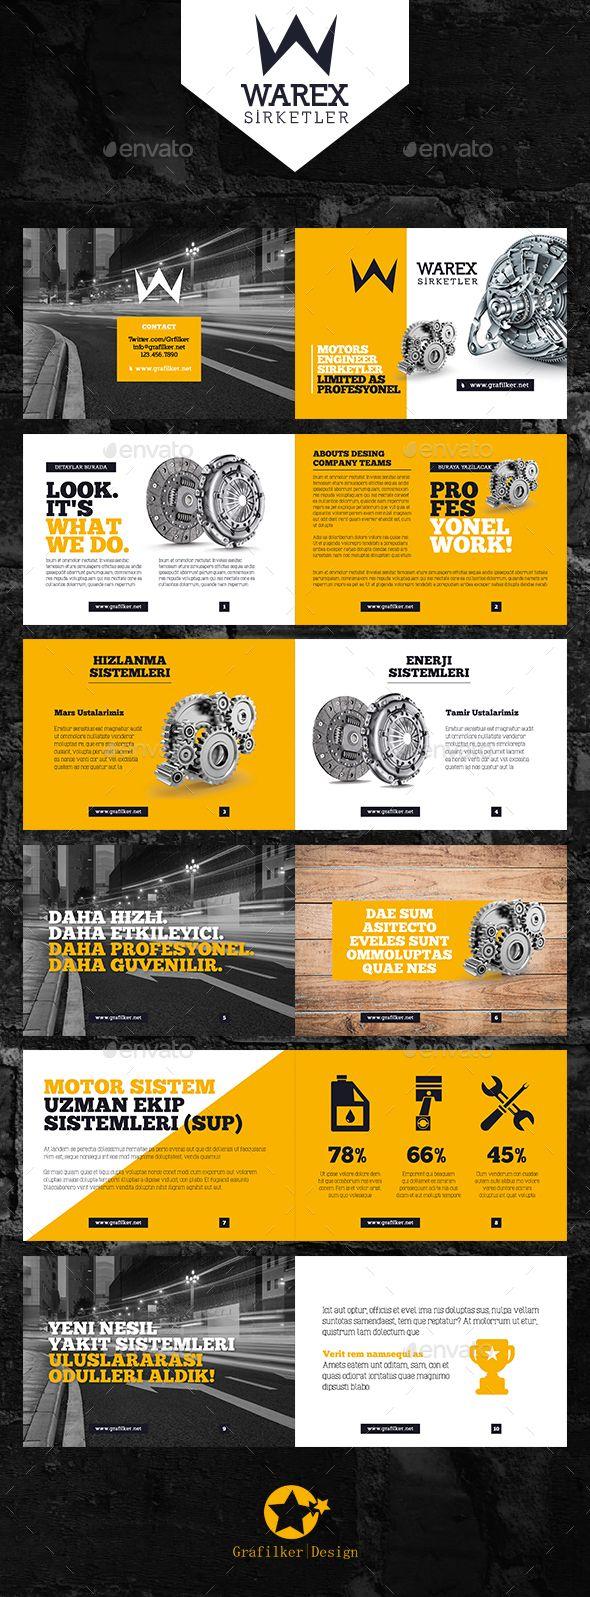 Product Information Brochure Templates Brochure Templates